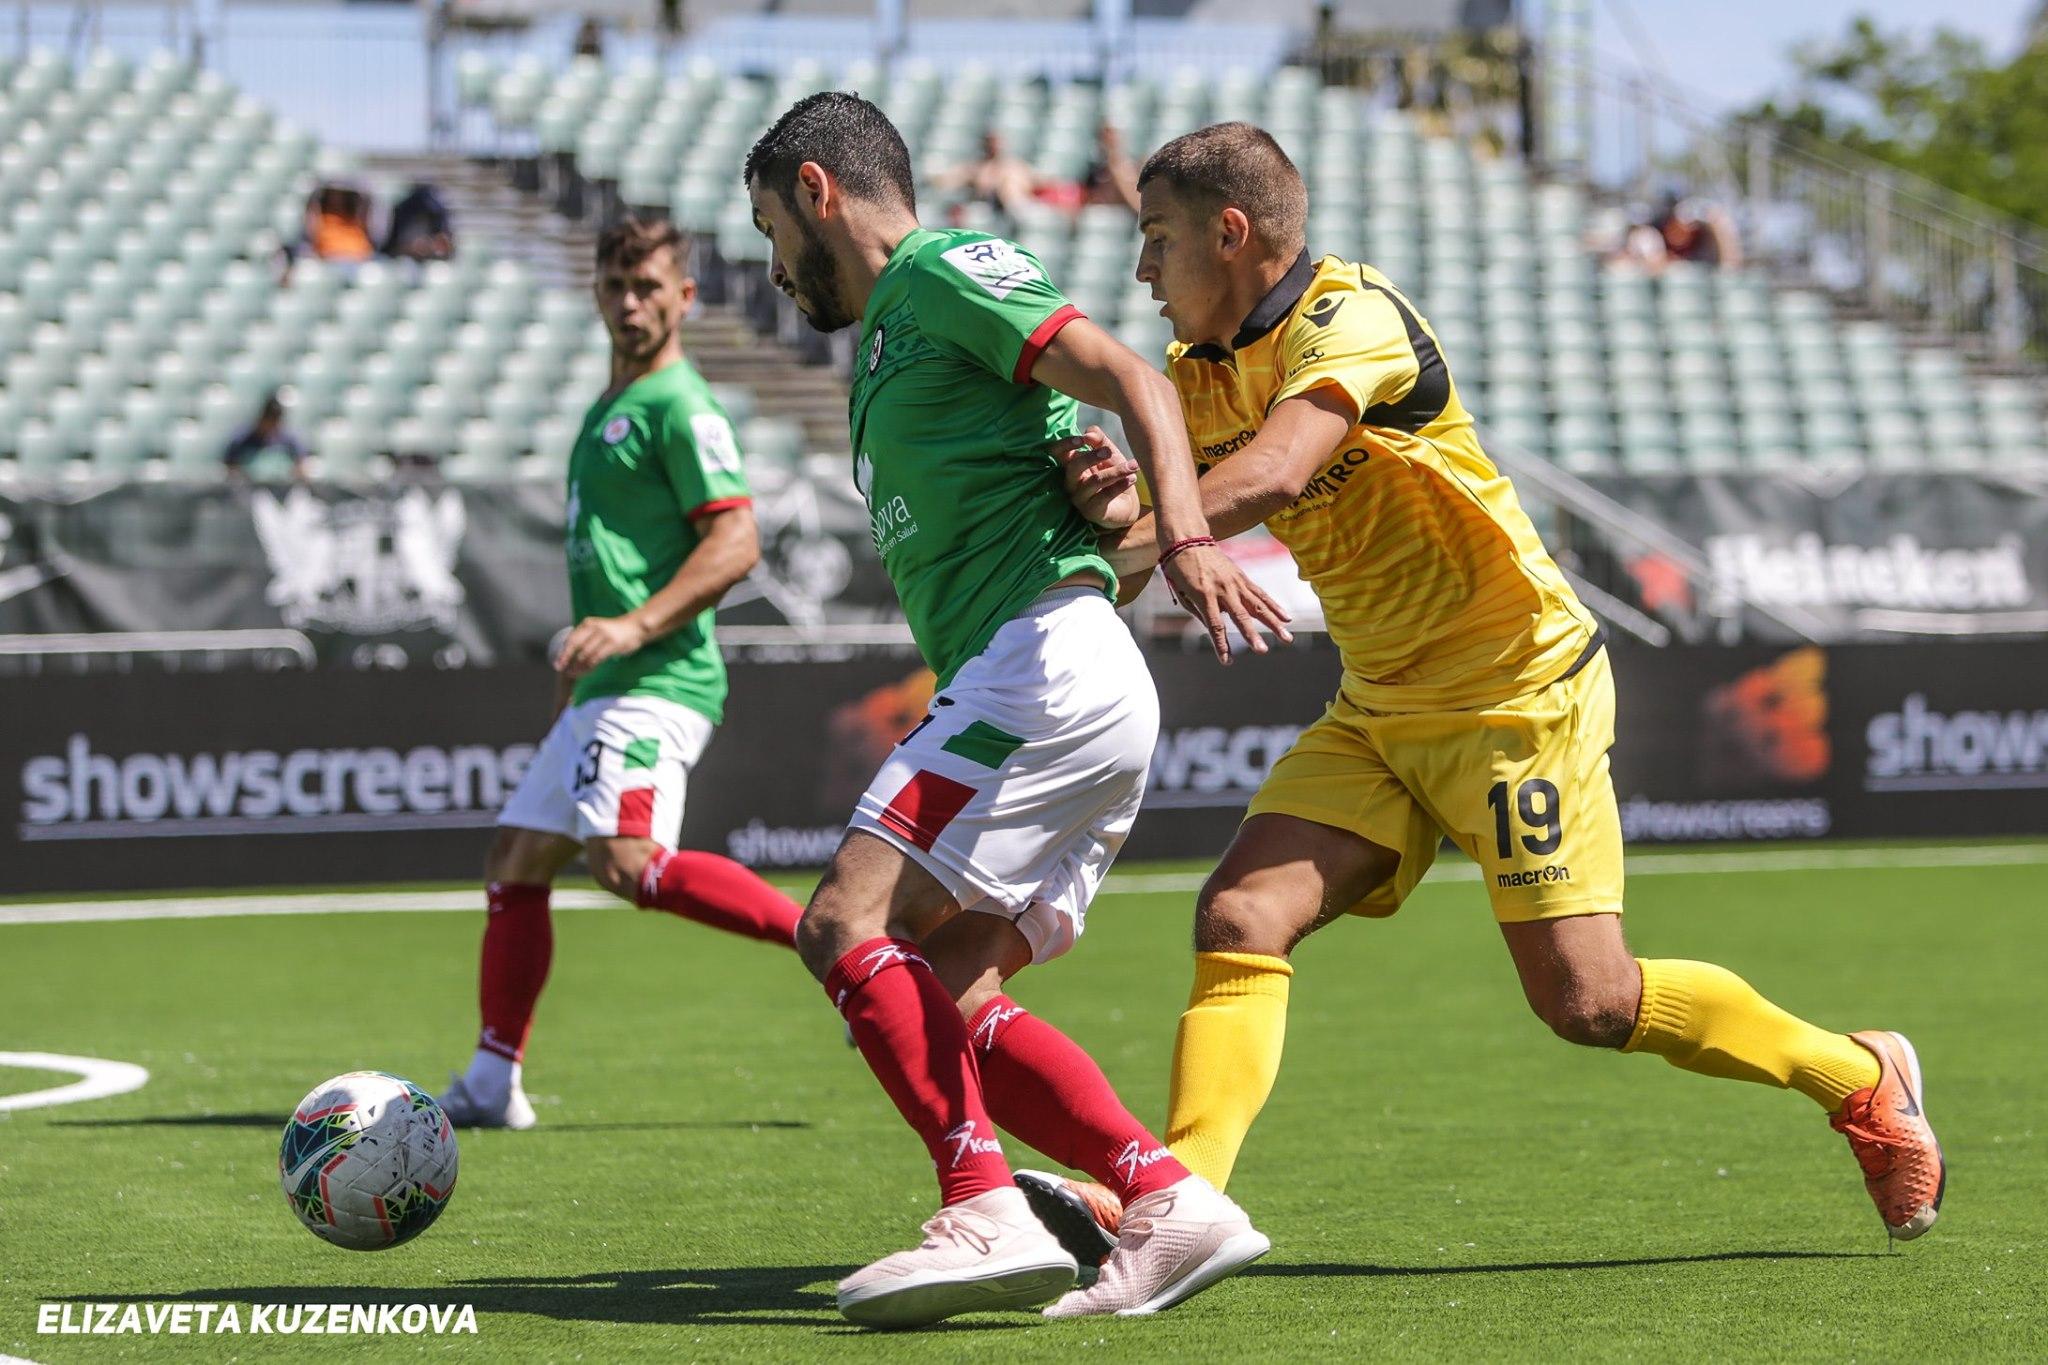 Mexico won the 2019 Mini-Football World Championship. Photo: Elizaveta Kuzenkova.